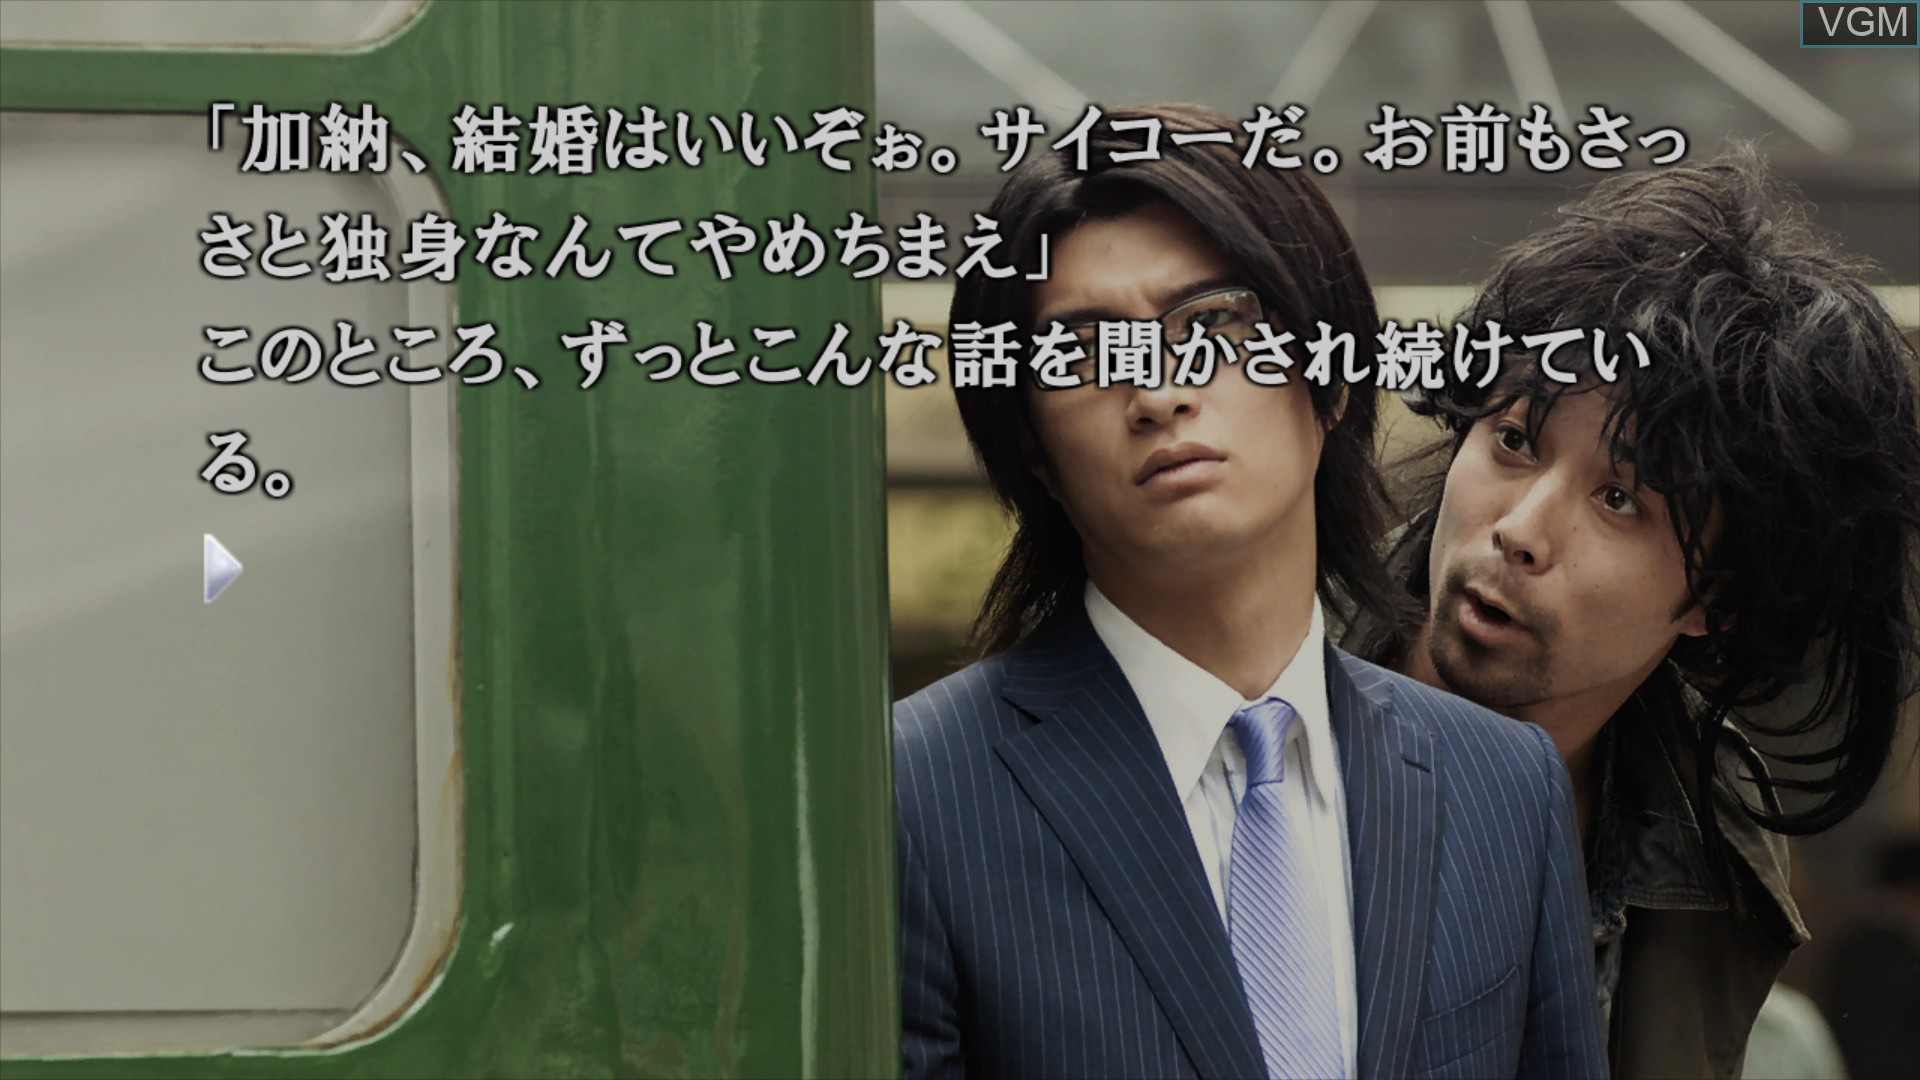 In-game screen of the game 428 - Fuusa Sareta Shibuya de on Sony Playstation 3